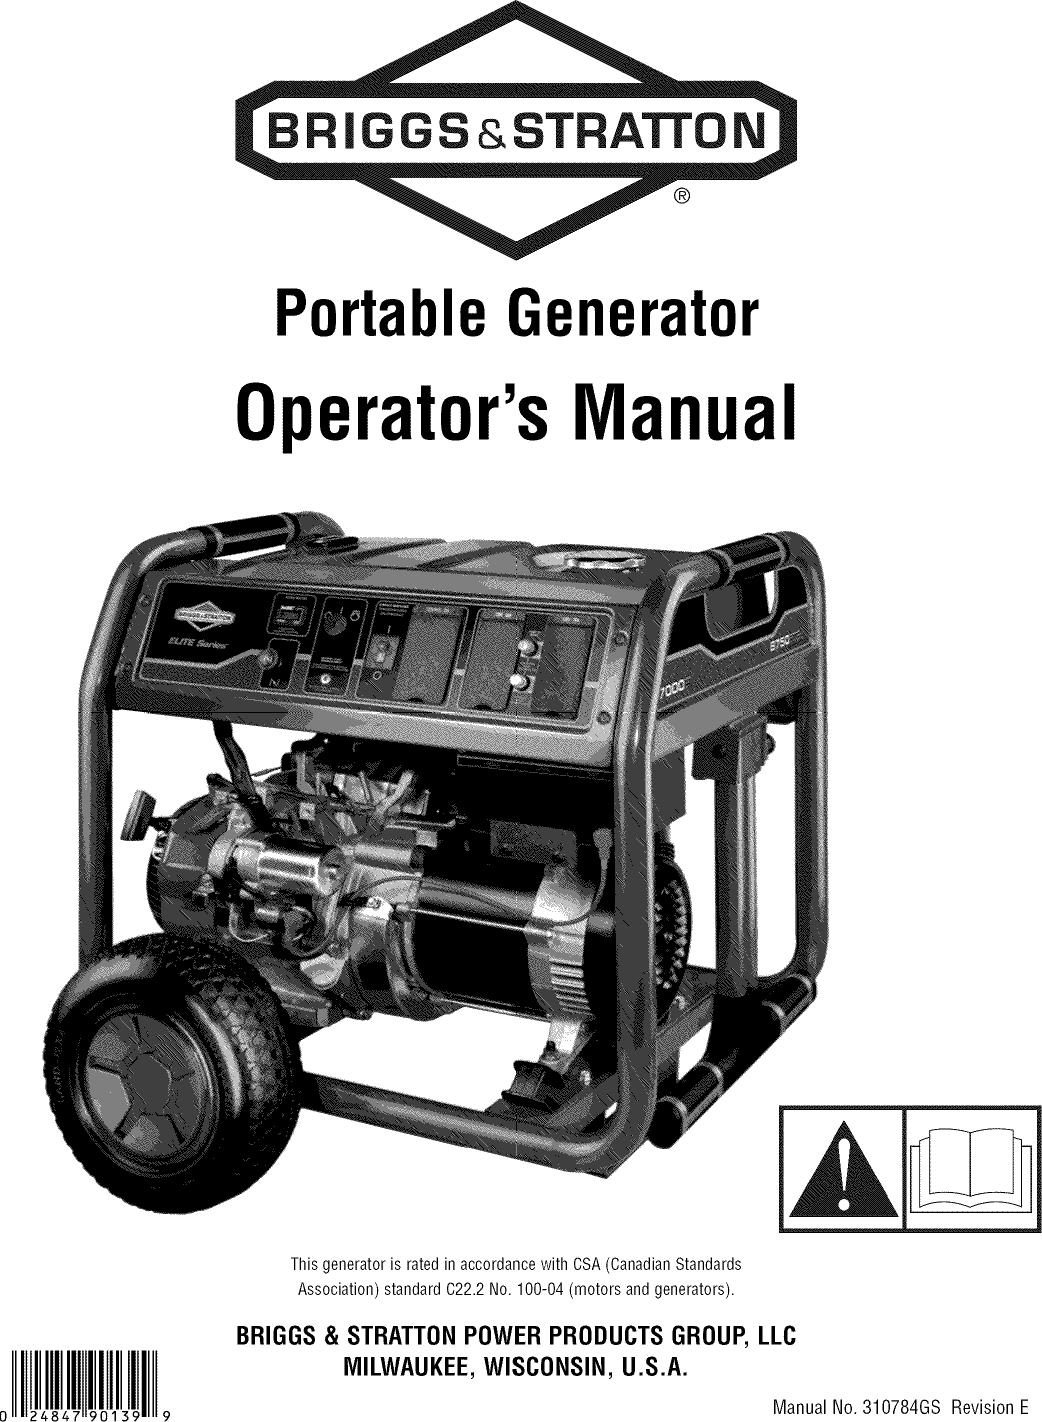 Briggs & Stratton 030470 0 User Manual GENERATOR Manuals